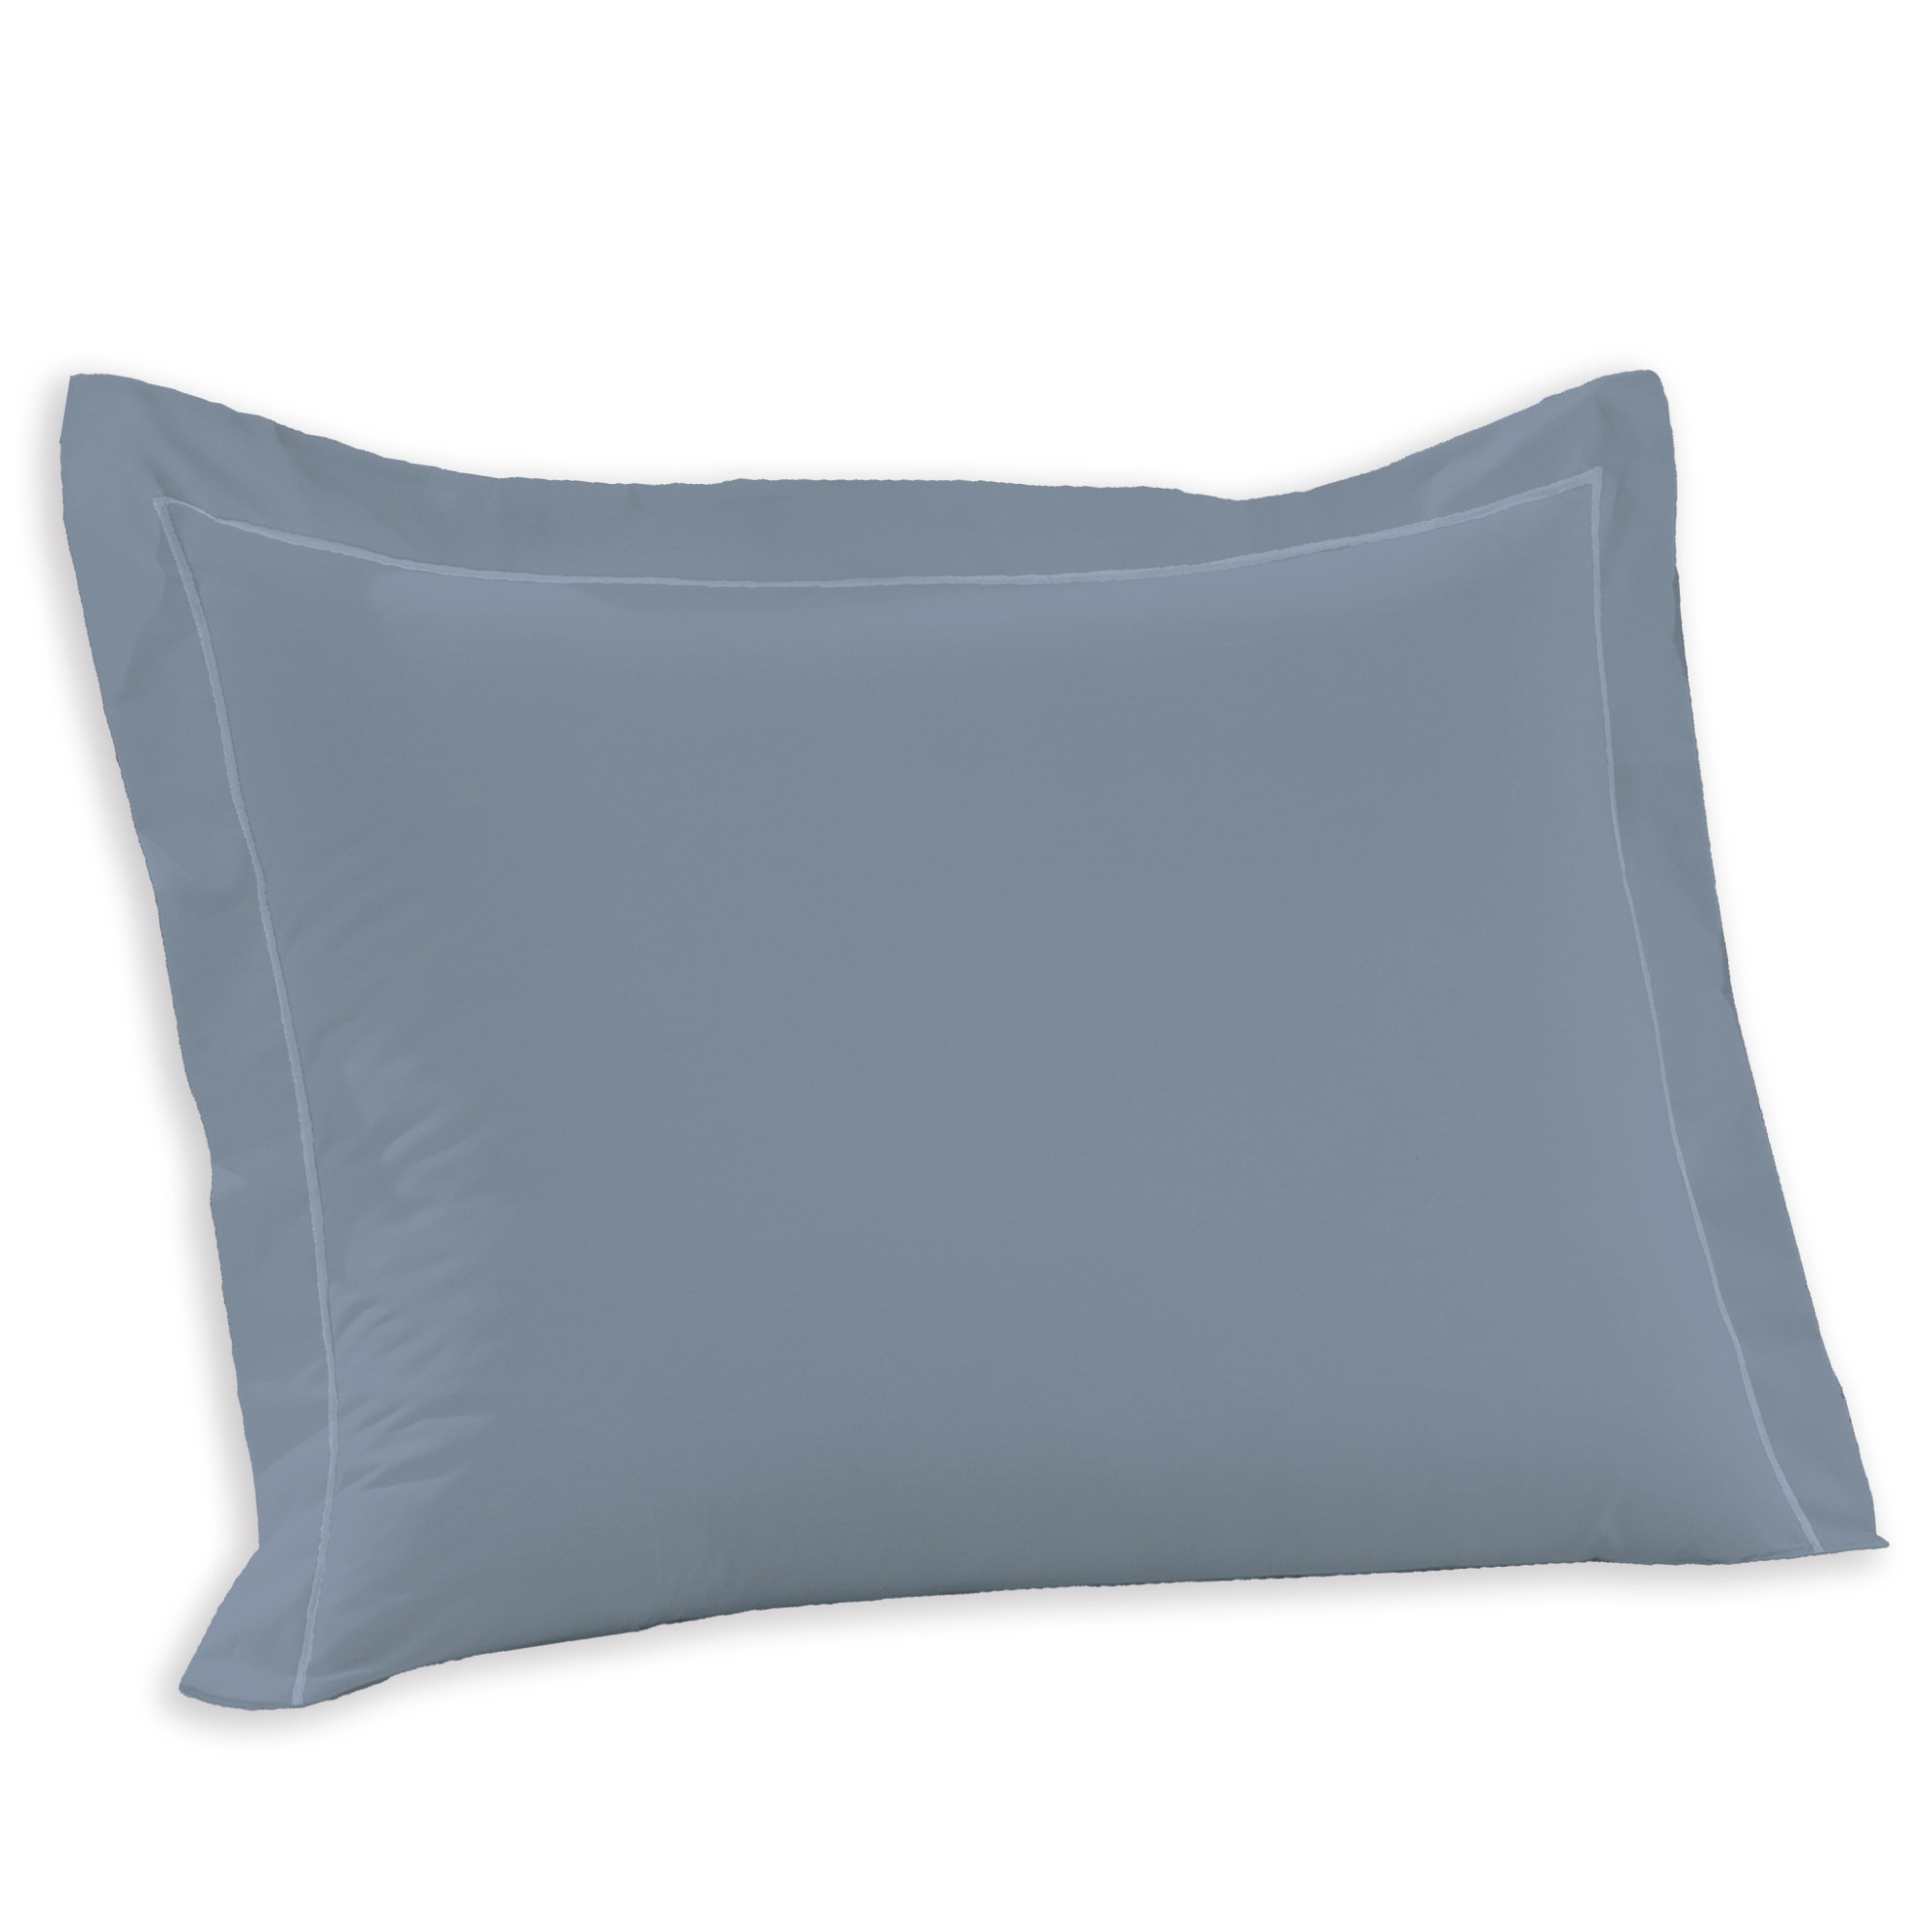 Fronha Azul 100 Algodao Reffinata Color - Buettner